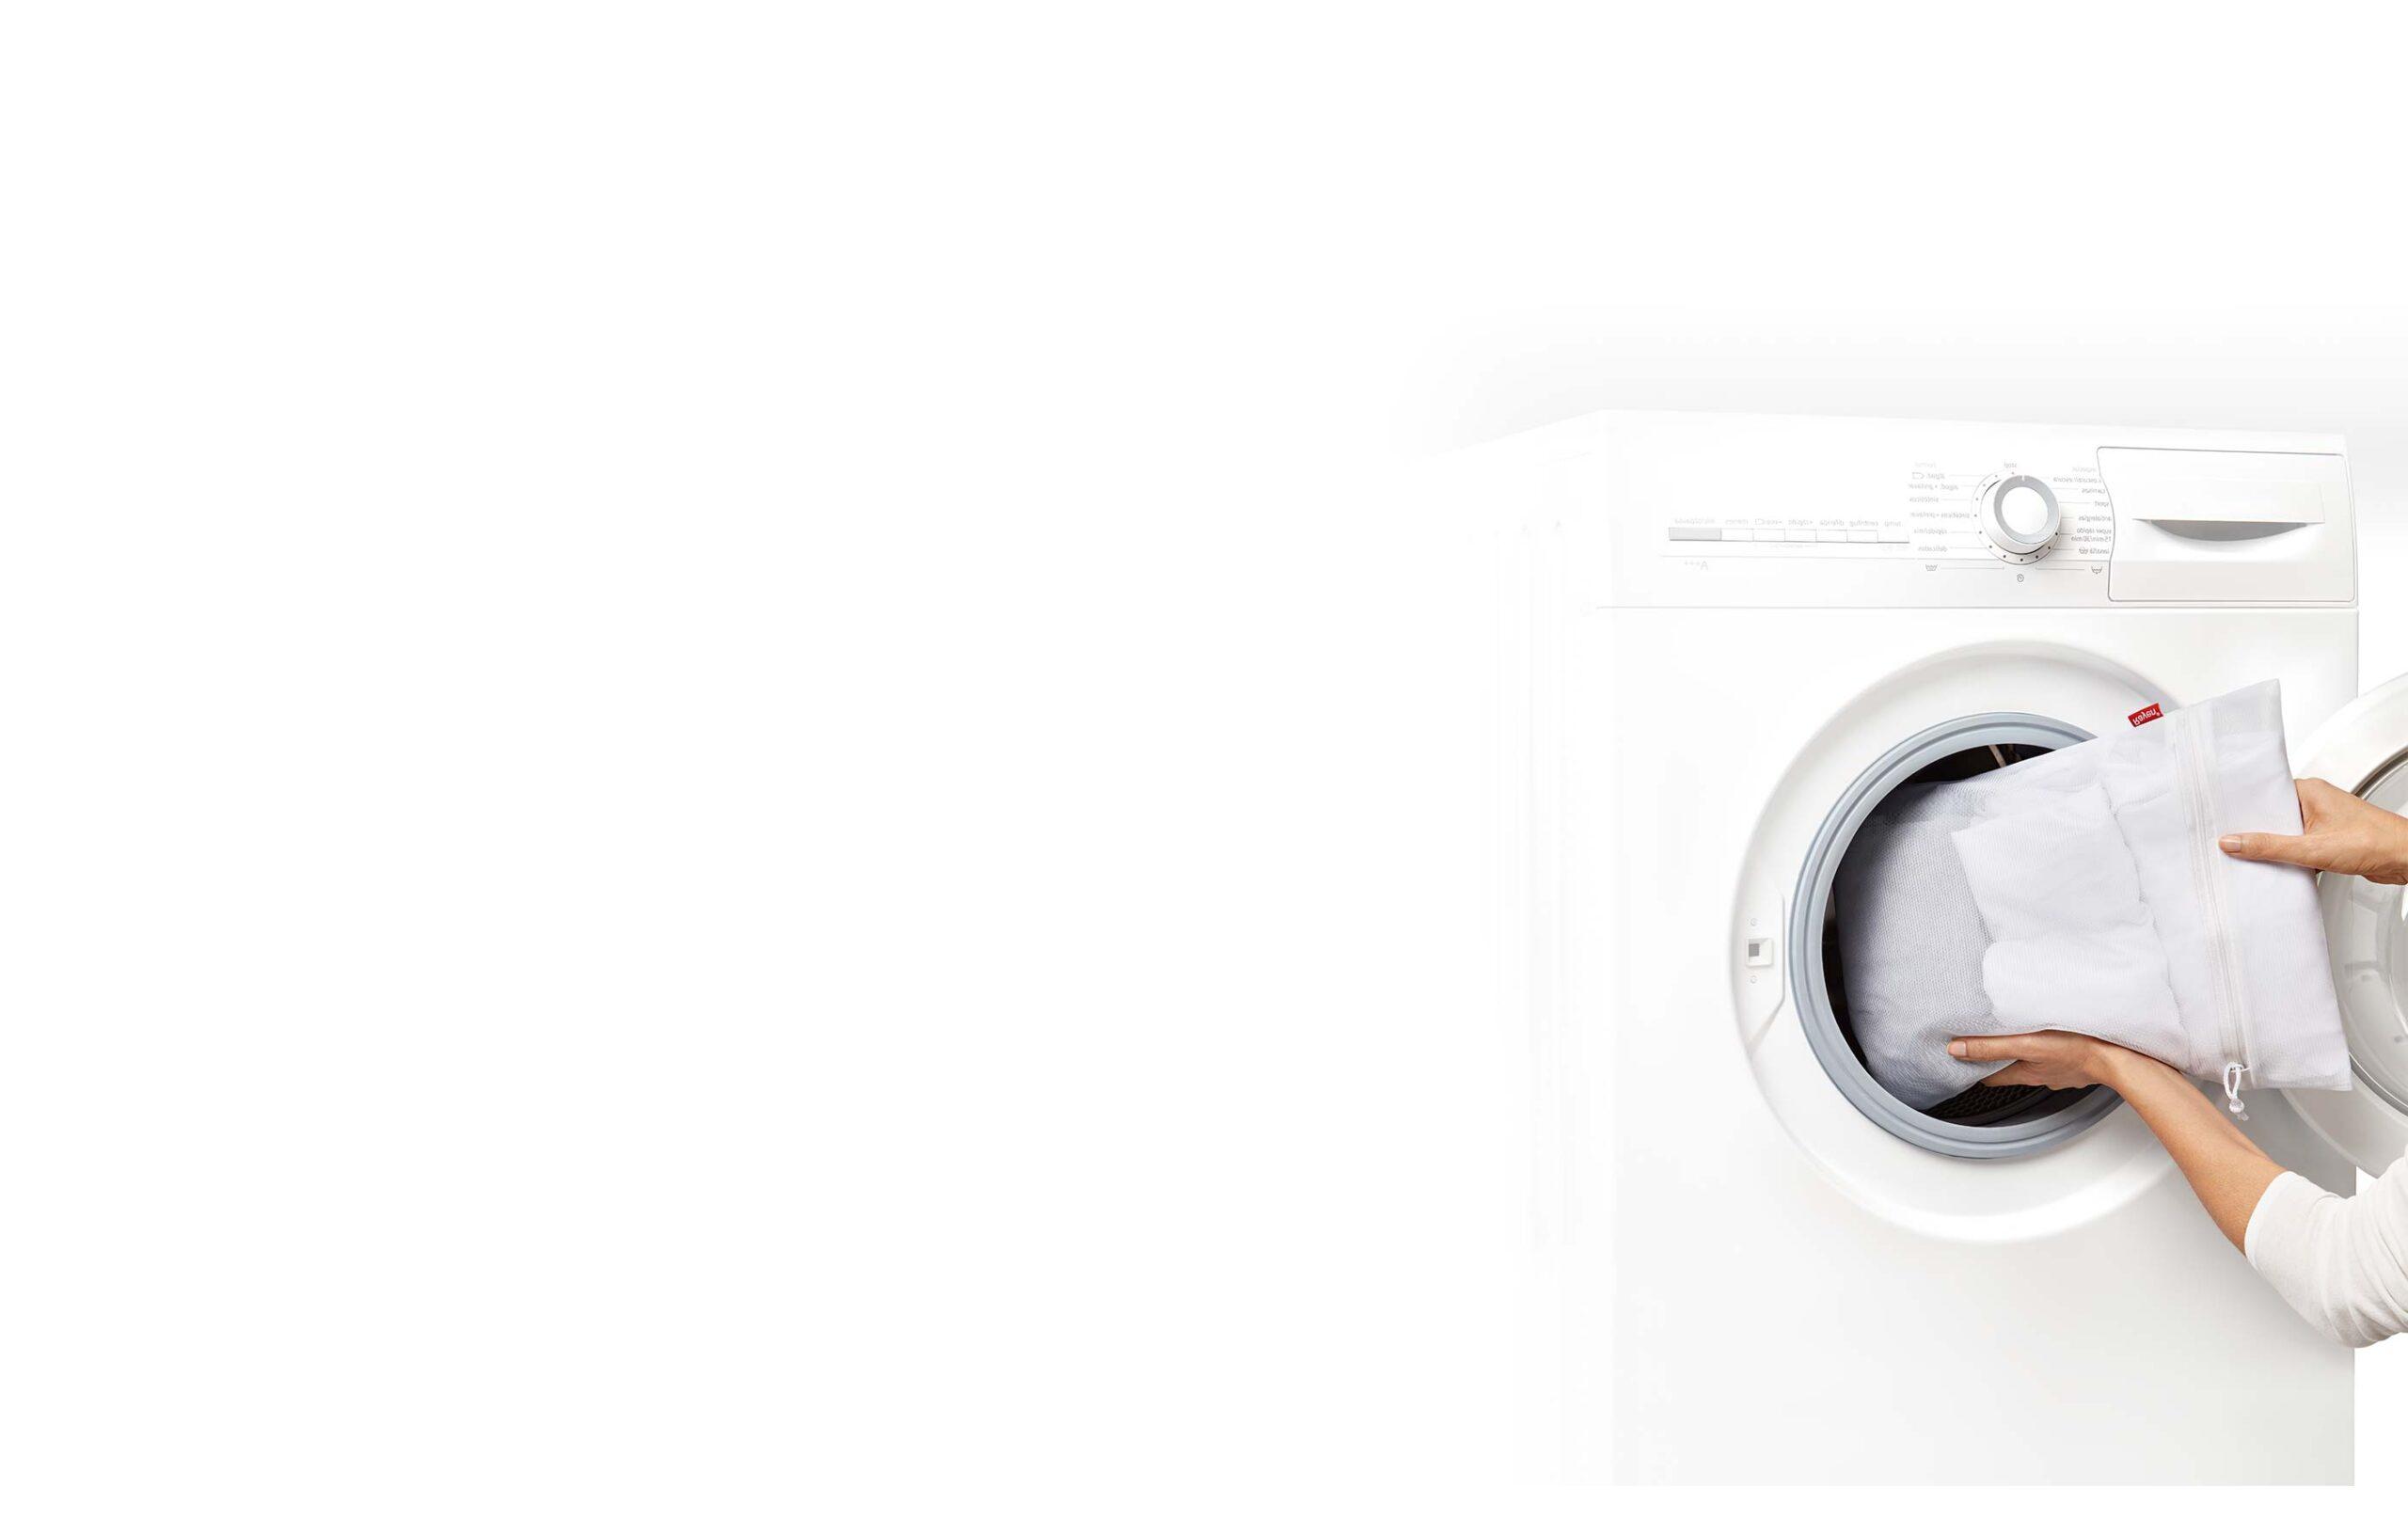 bolsa-lavadora-4-scaled bolsa-lavadora-4 | Rayen.com